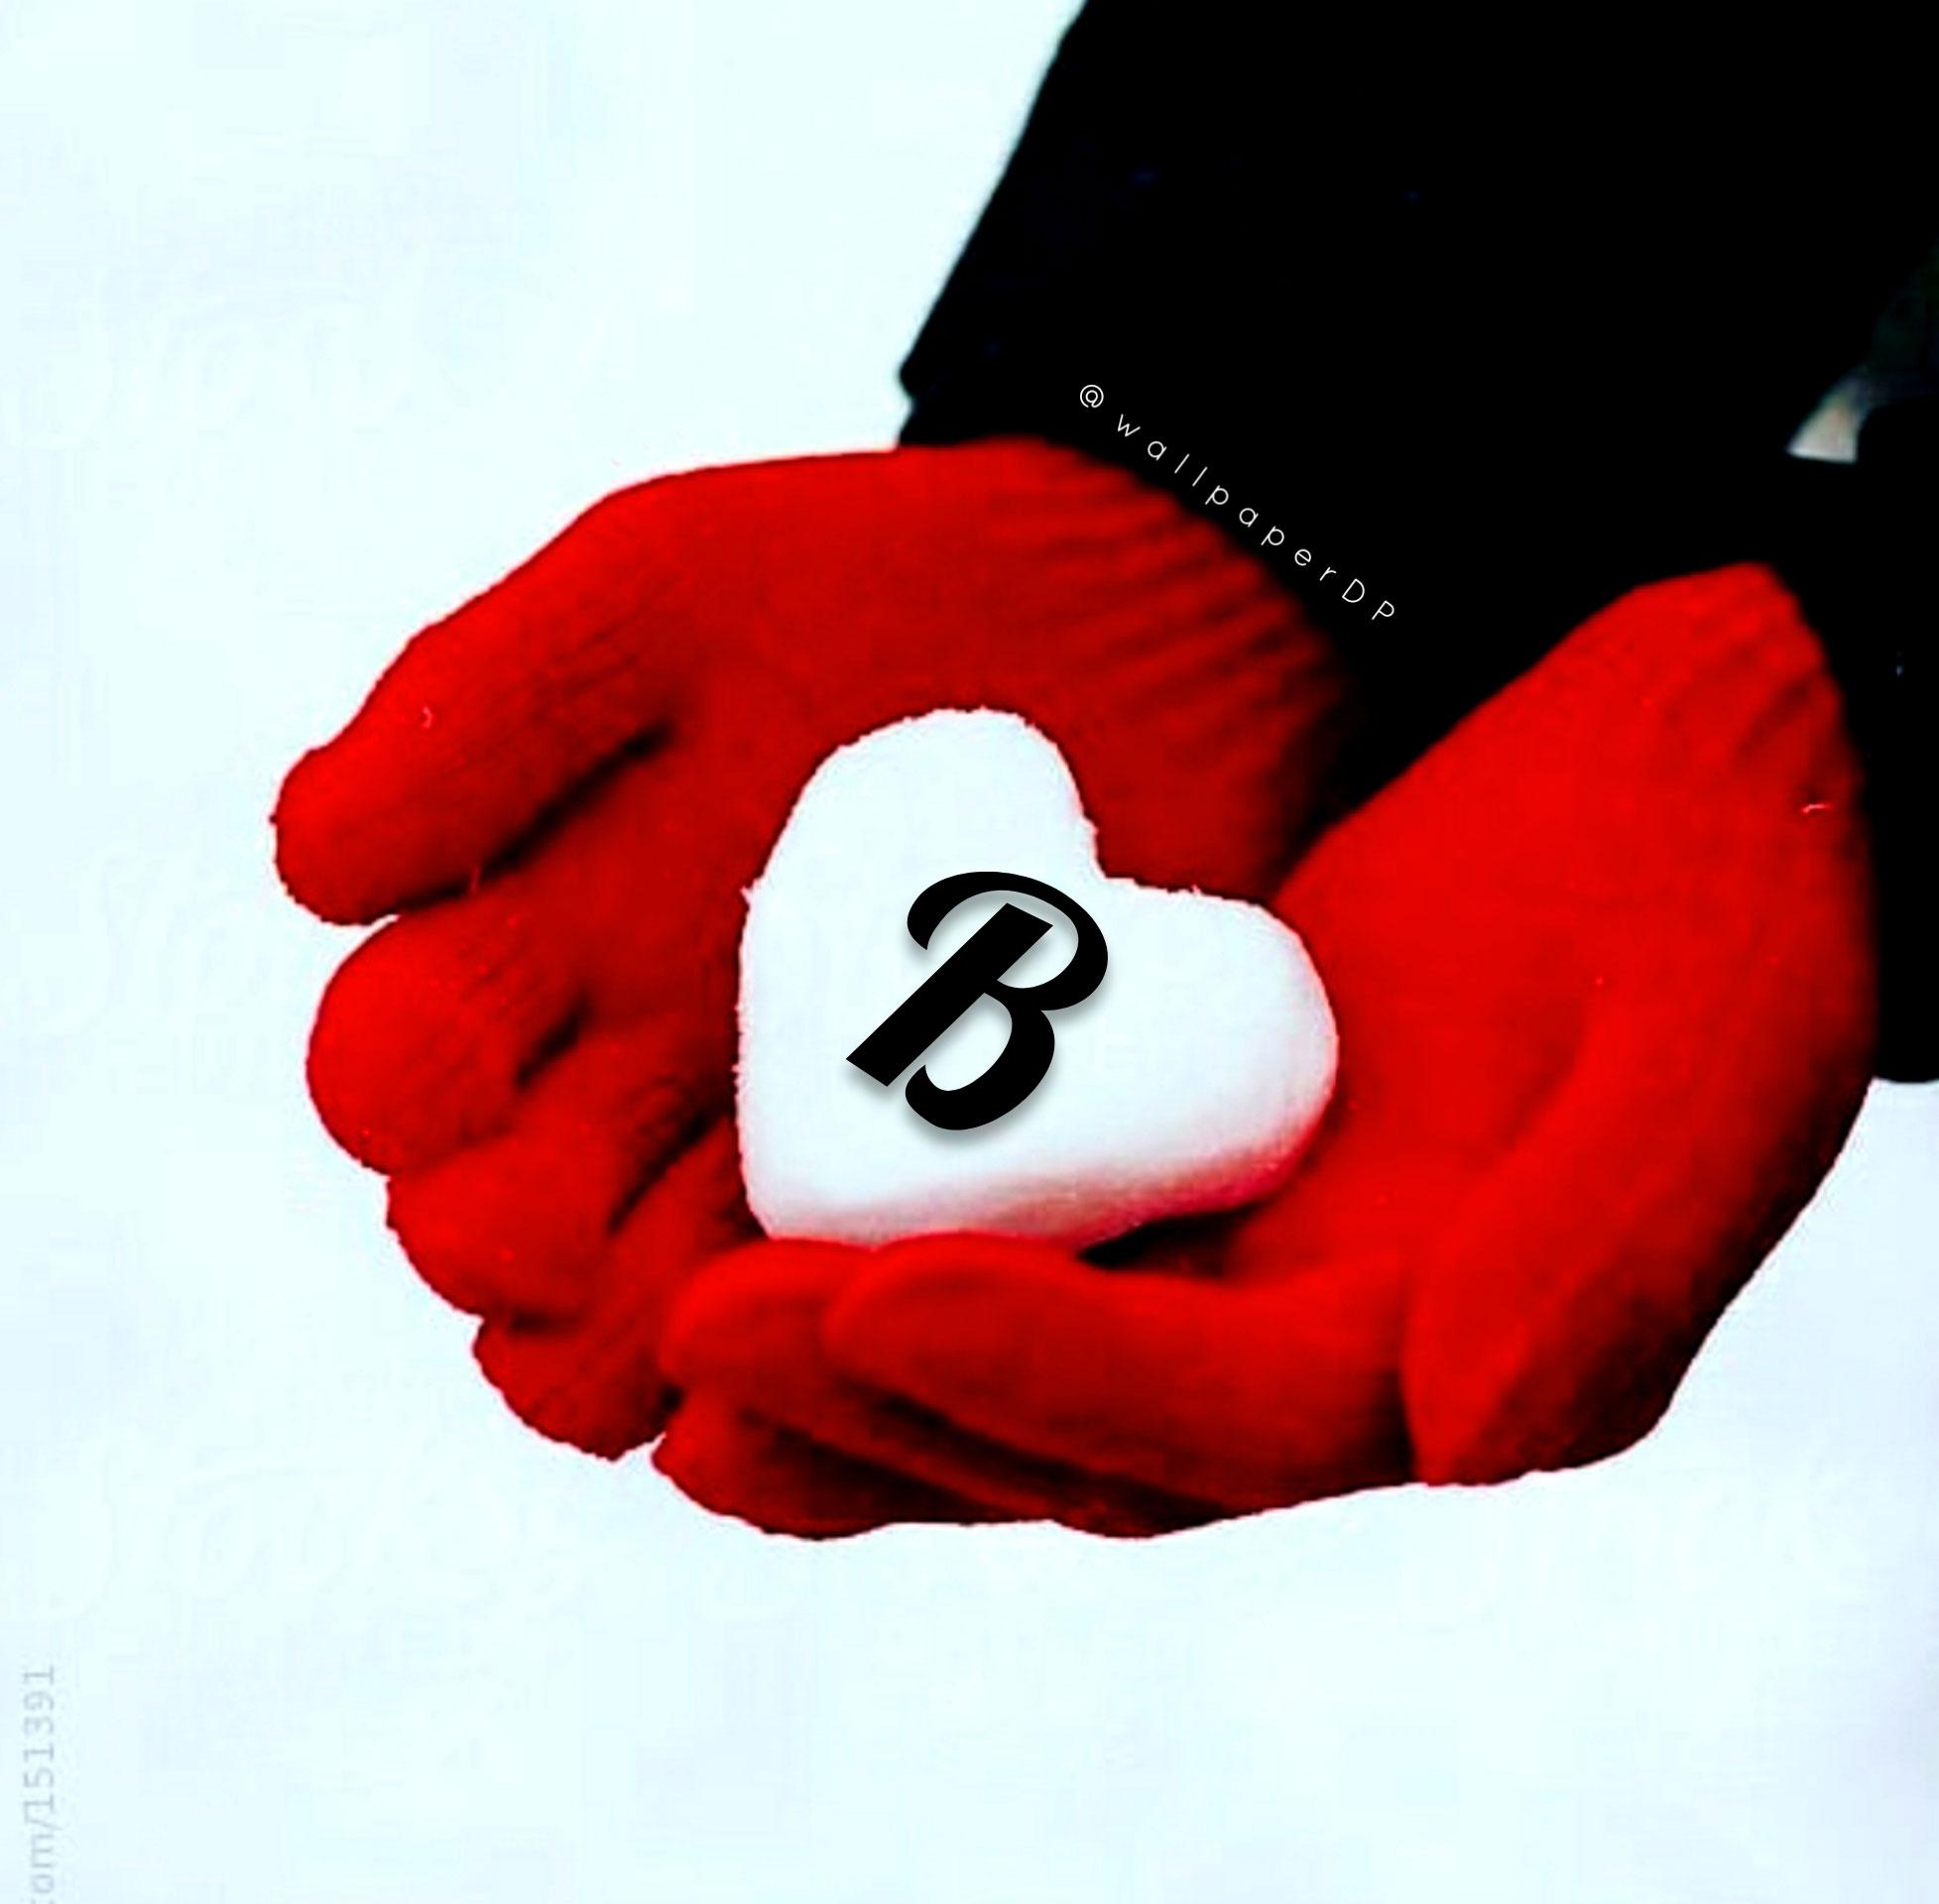 New Nice B Name Dp Images